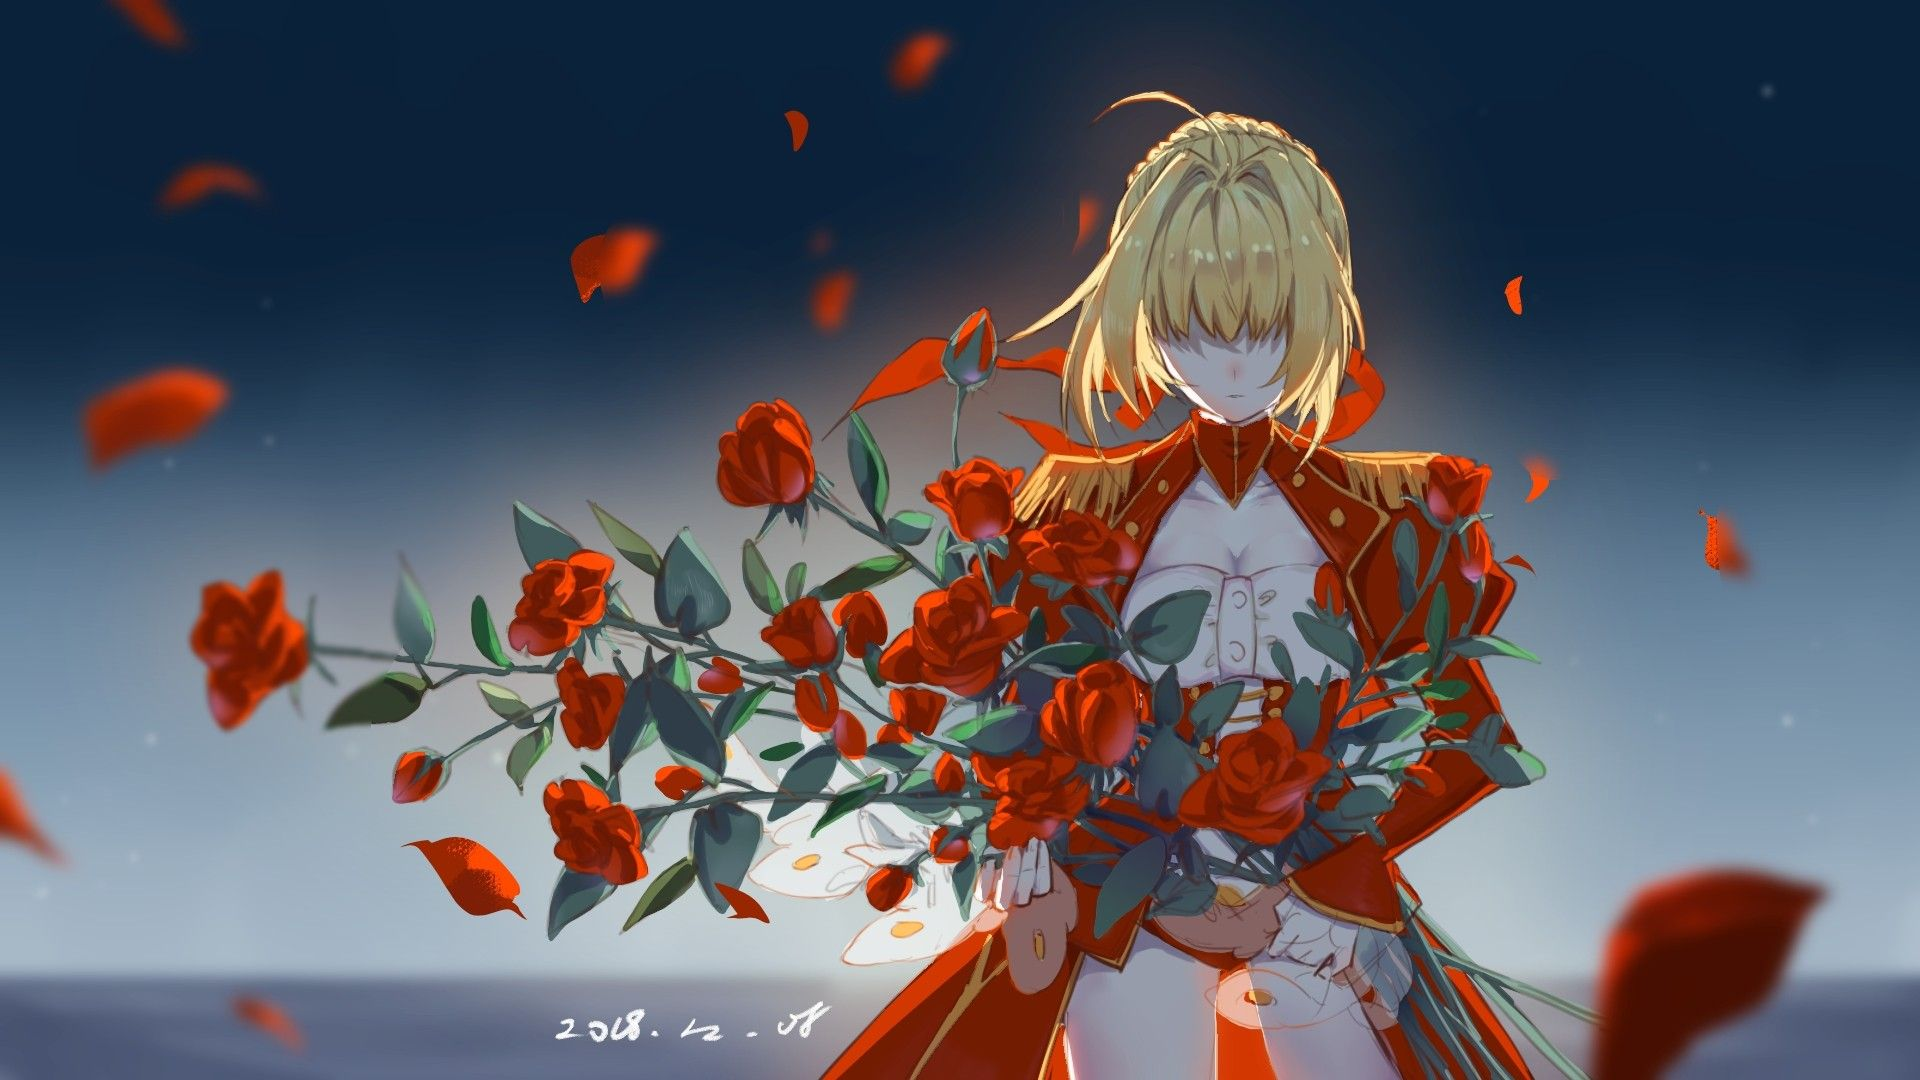 Pin de Zelan em Fate/Series Nero Claudius (Saber